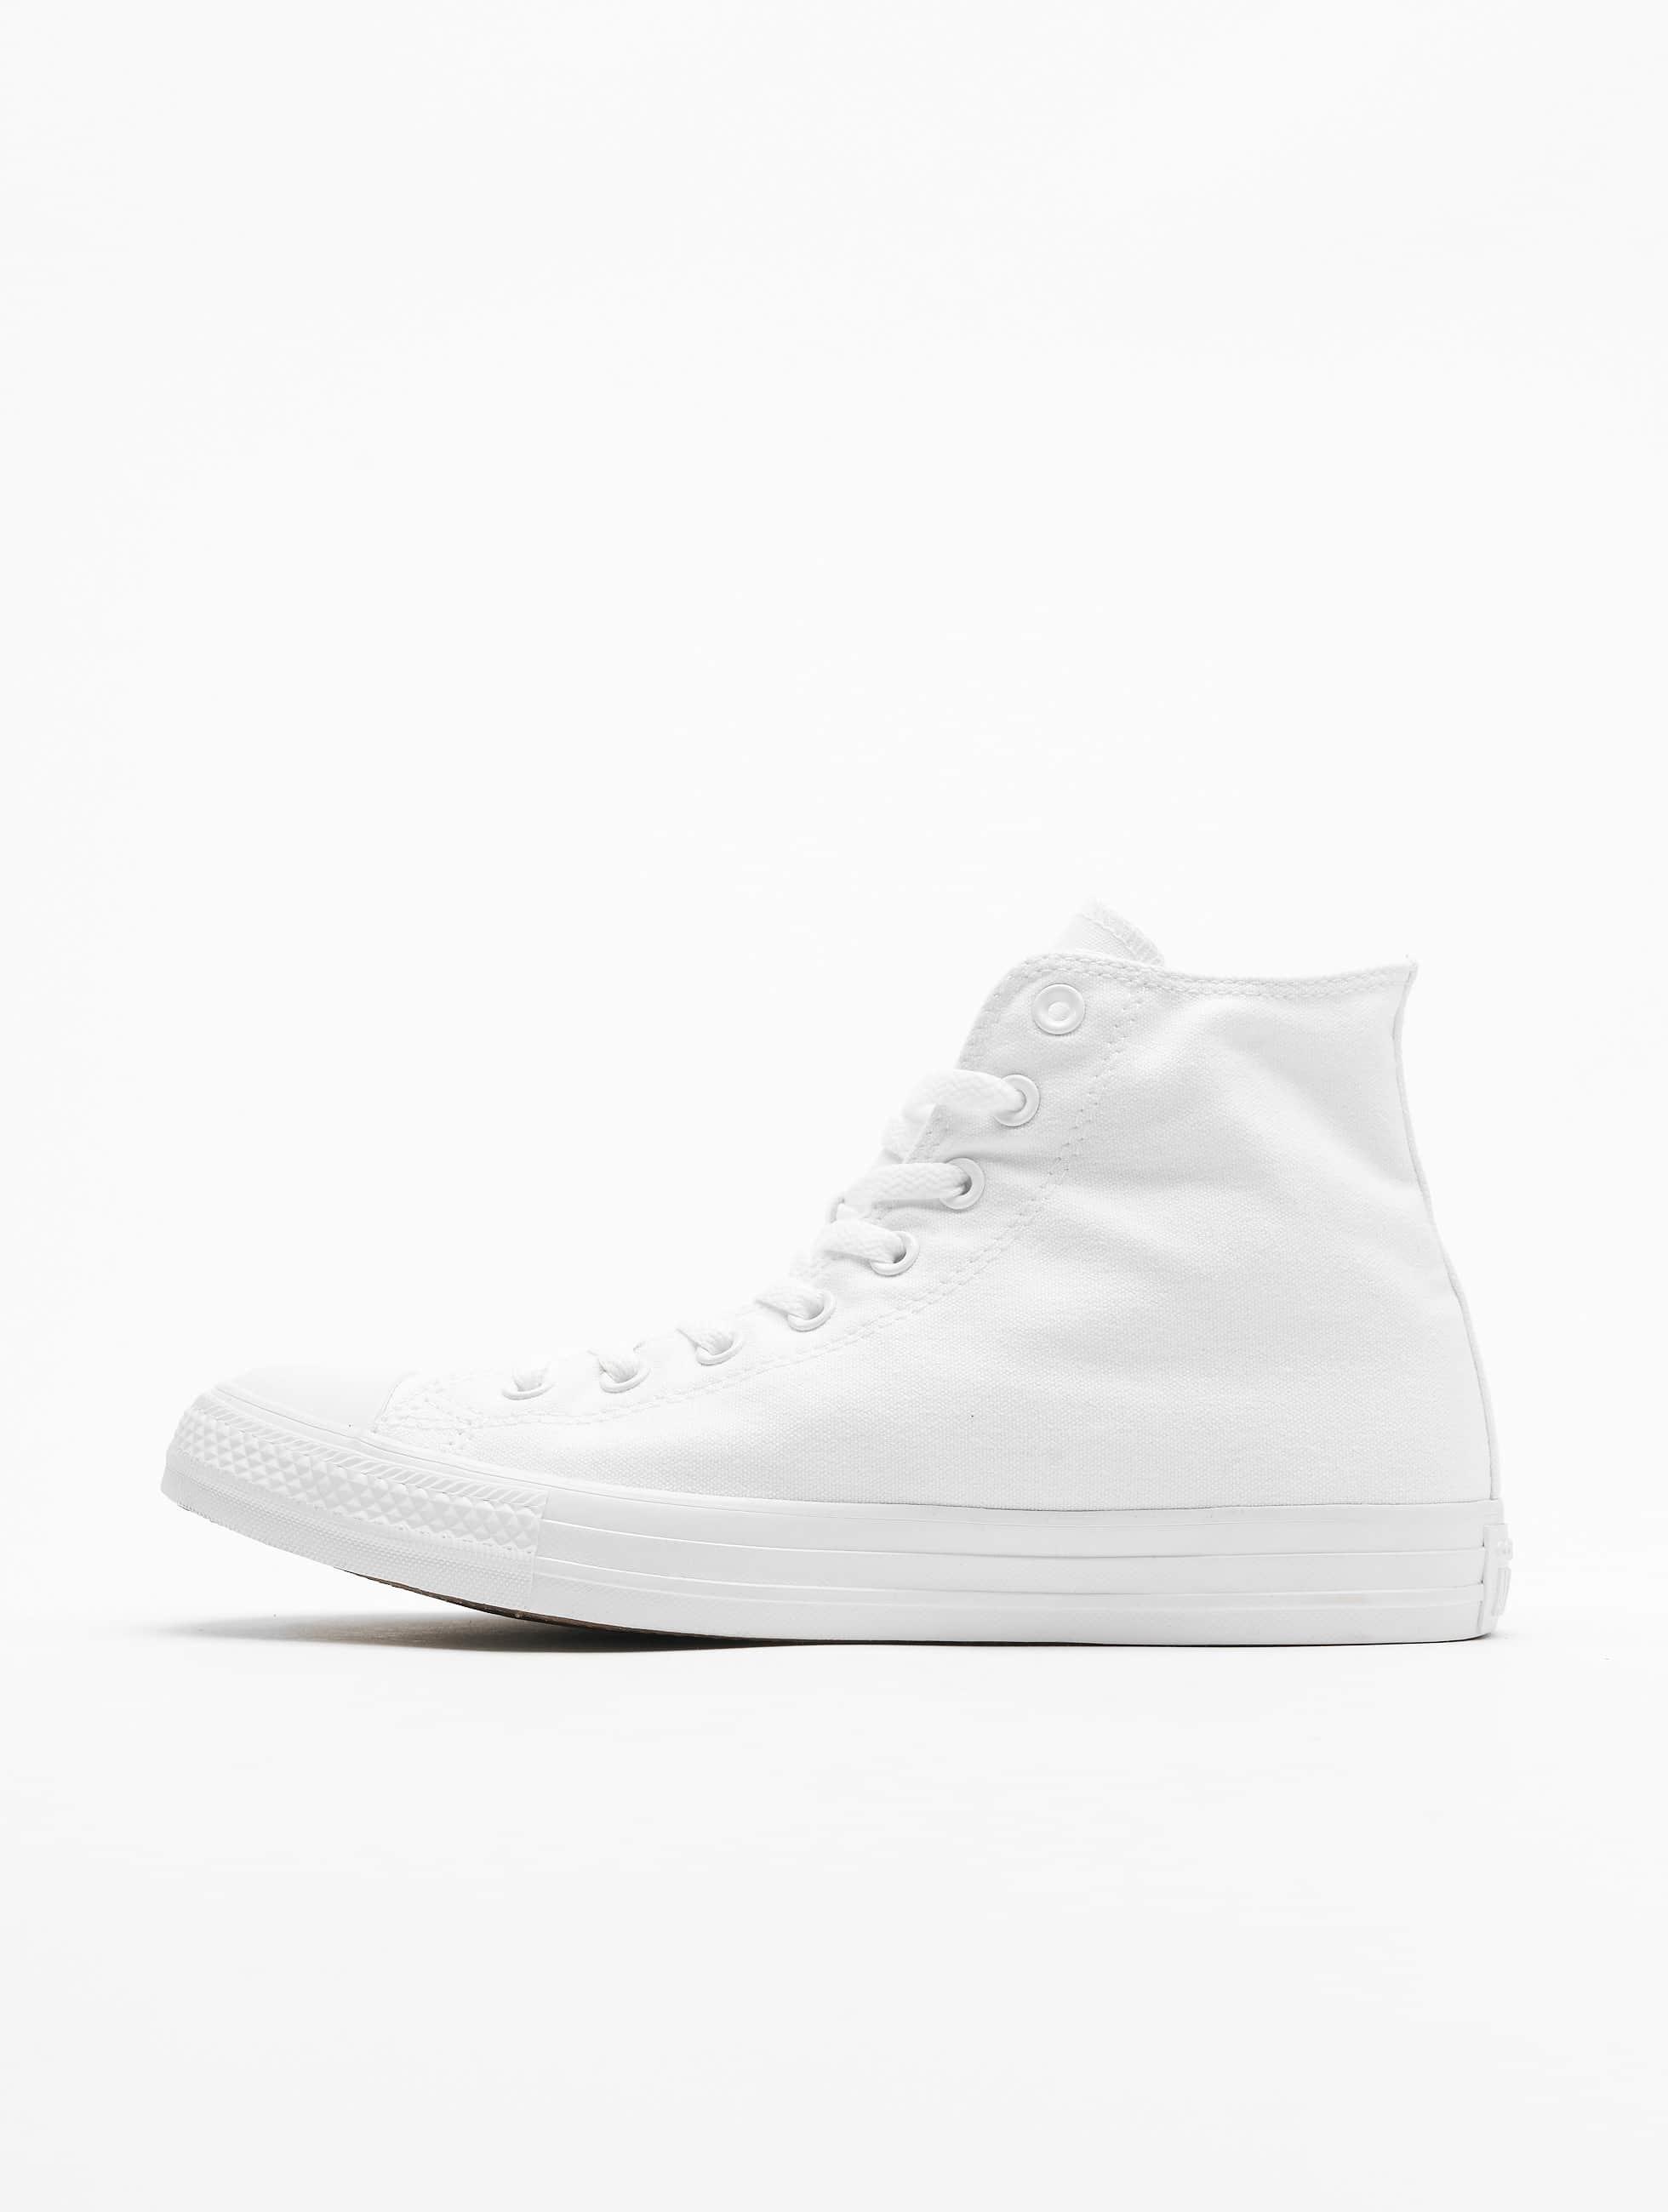 converse herren sneaker chuck taylor all star high in wei 156913. Black Bedroom Furniture Sets. Home Design Ideas